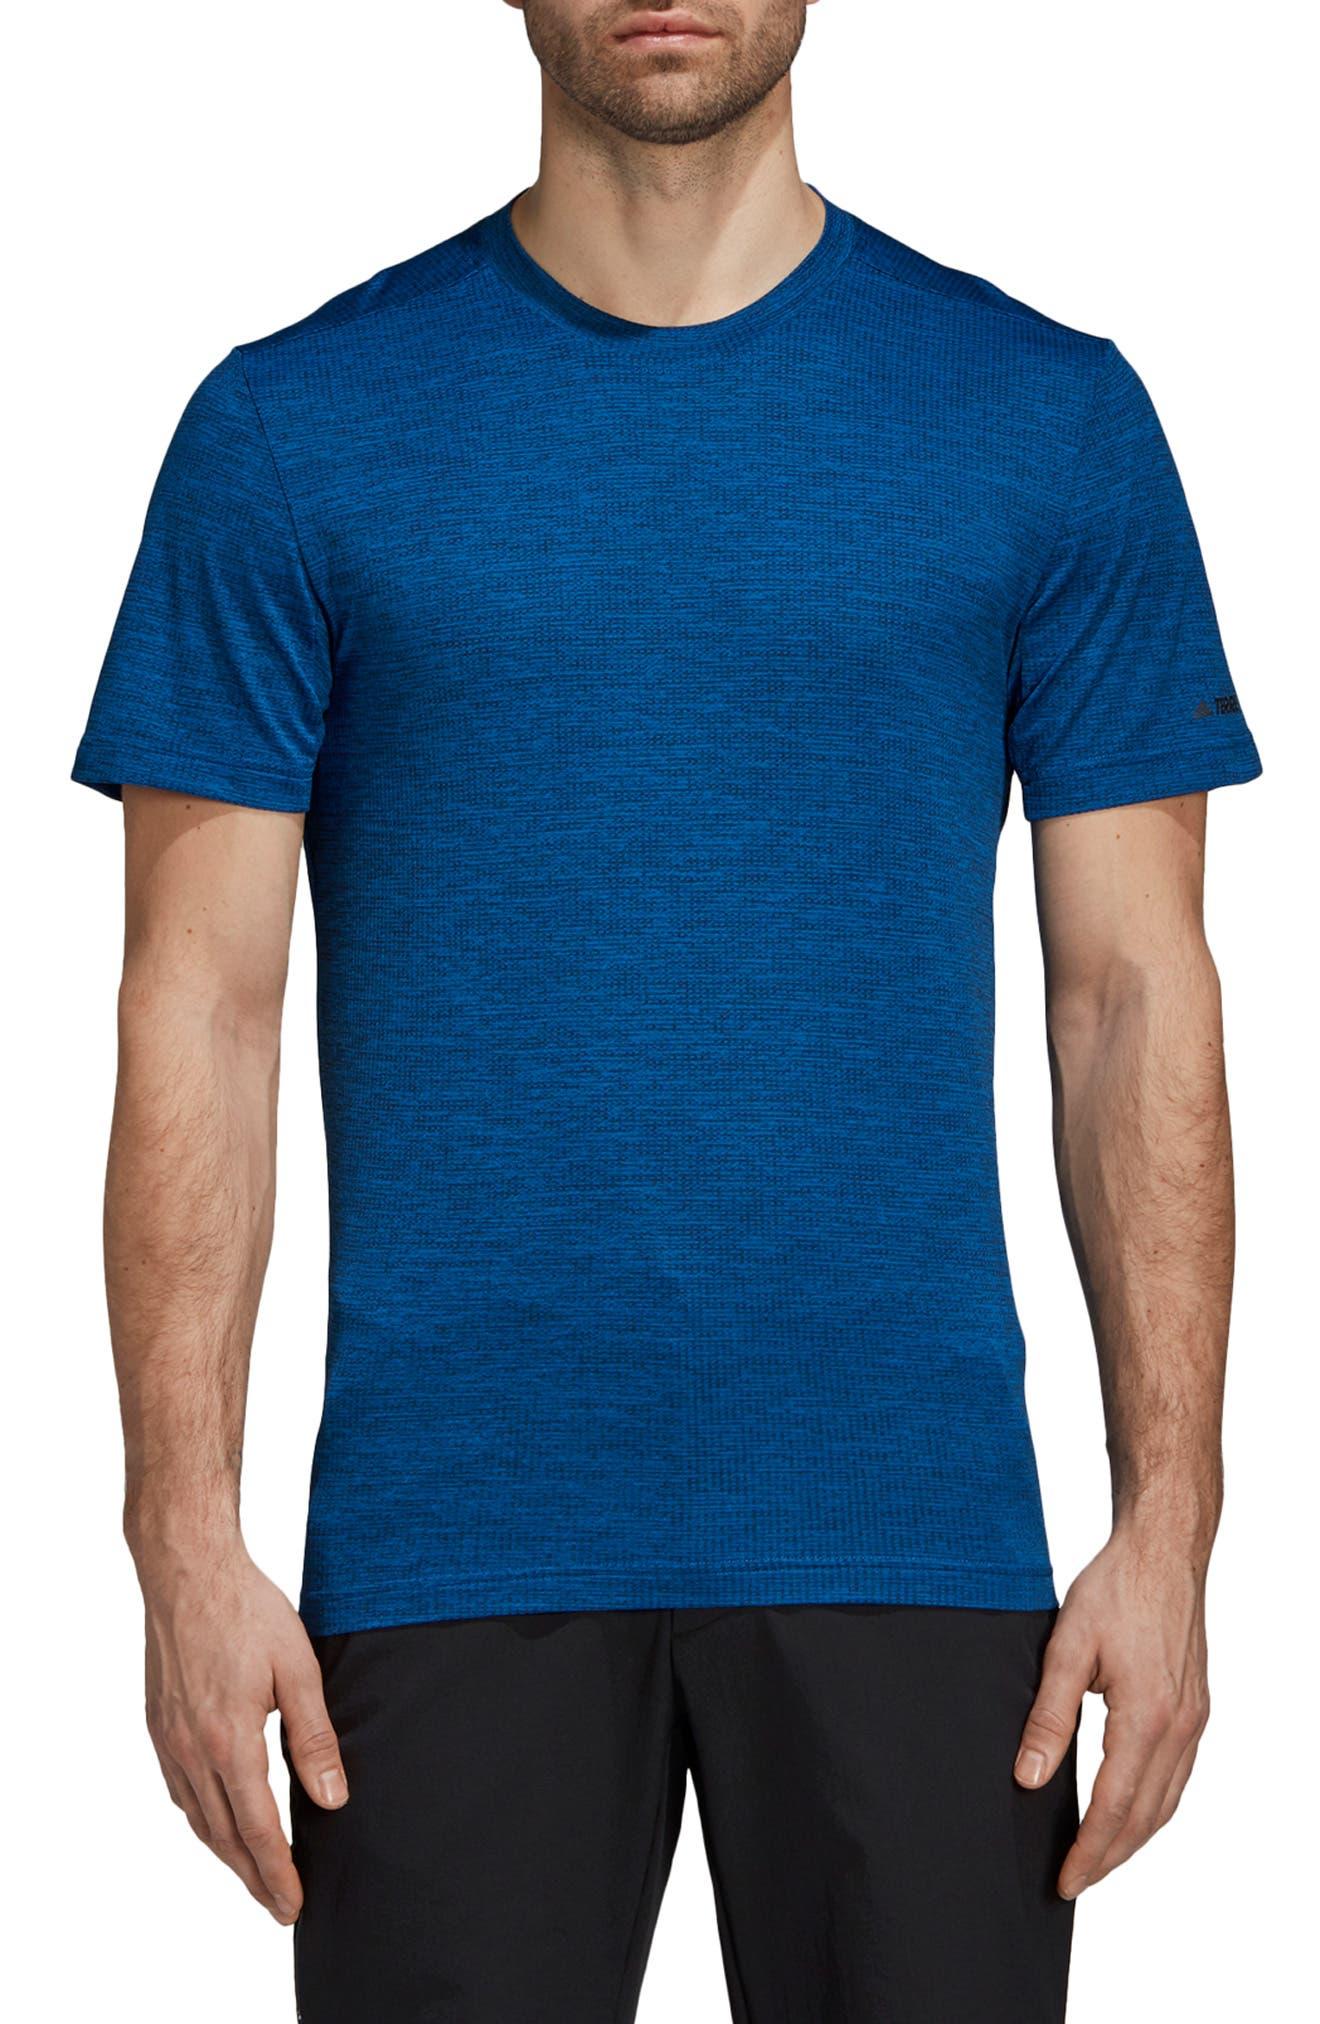 Adidas Tivid Climalite T-Shirt, Blue